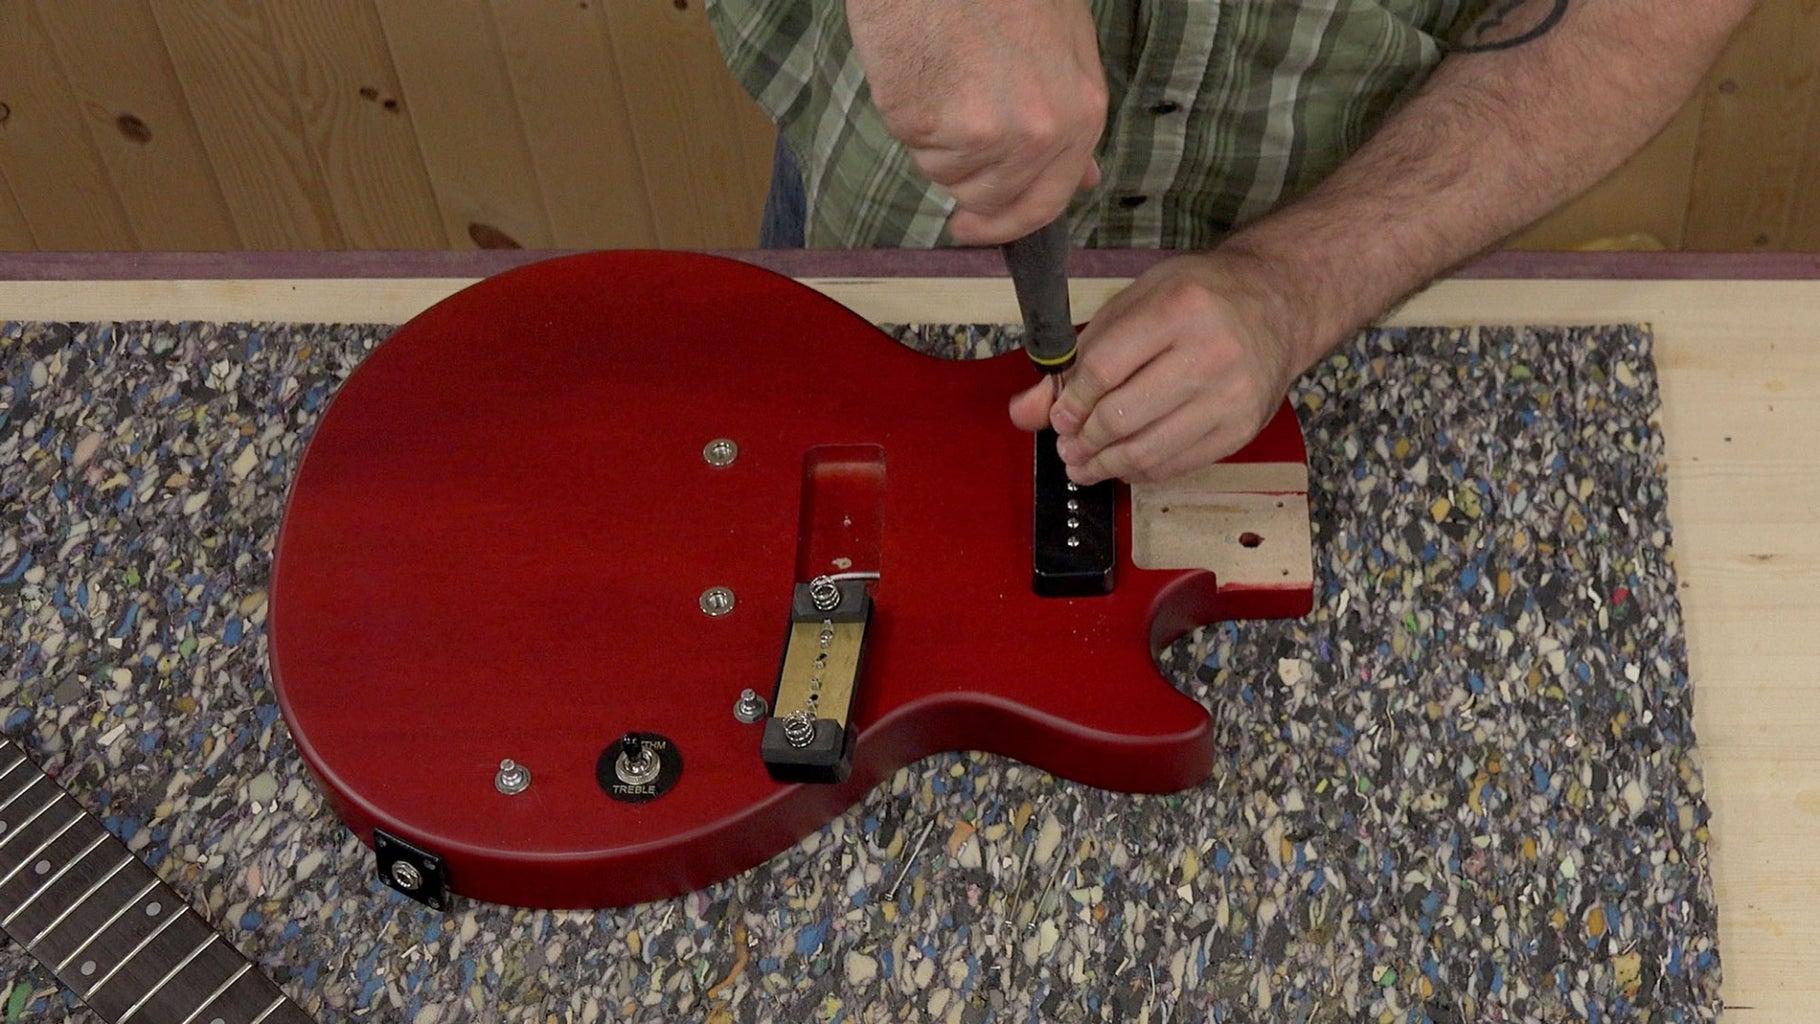 Gut the Sacrificial Guitar